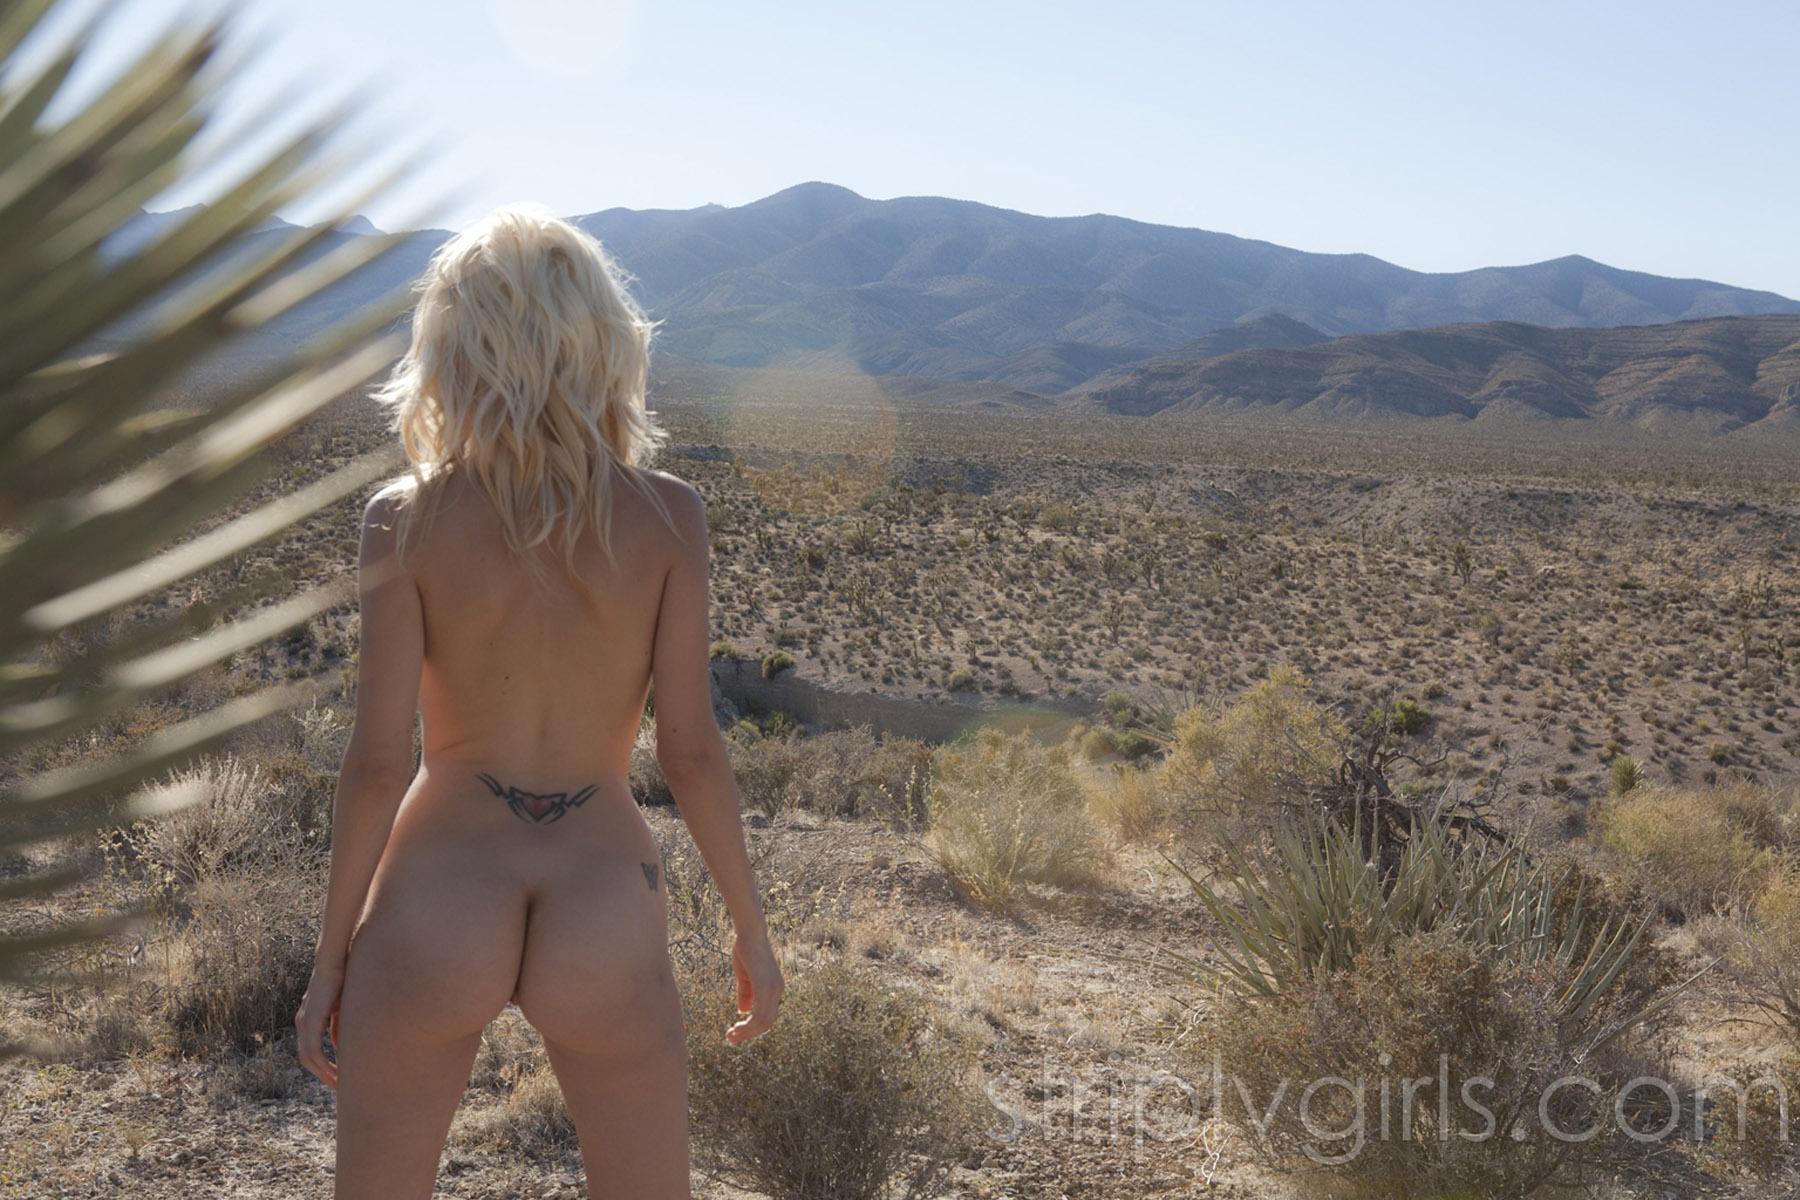 nude-desert-sluts-gy-barnyard-licking-pussy-porn